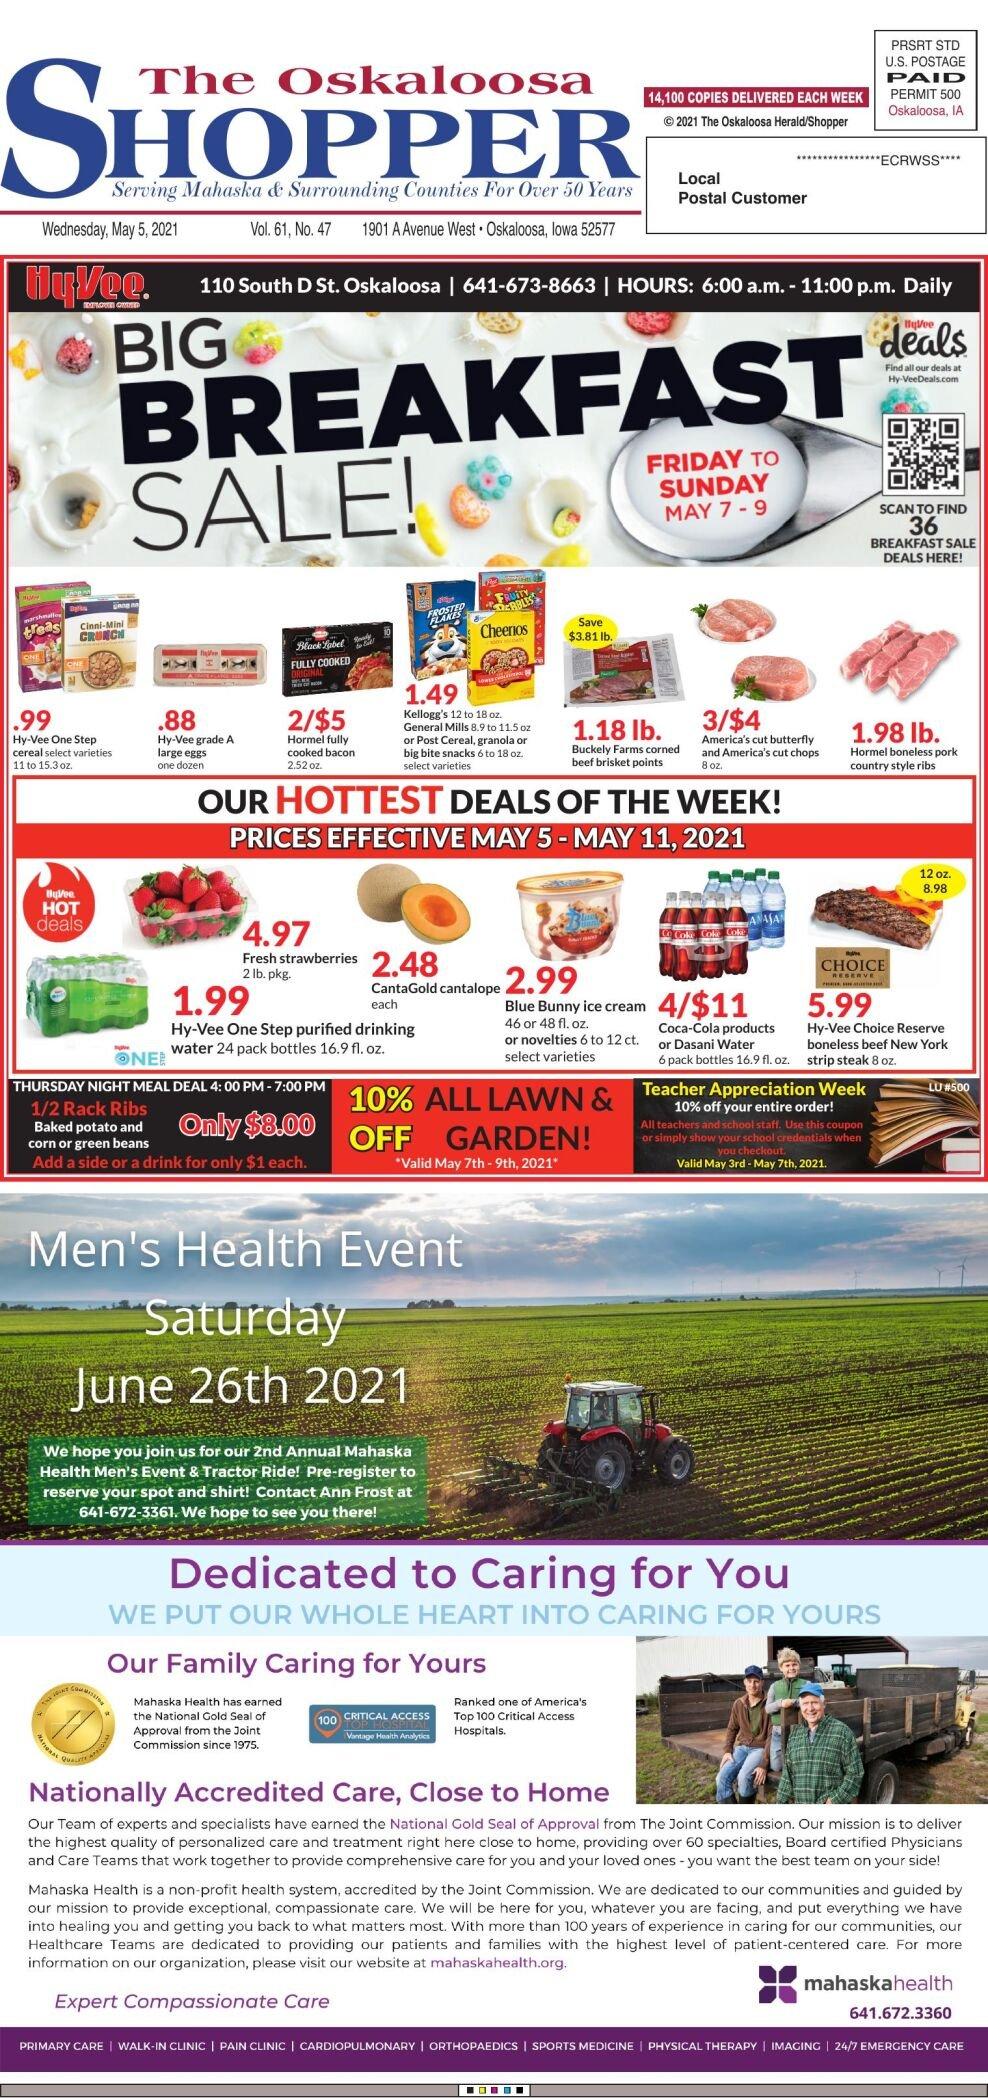 The Oskaloosa Shopper week of 05/05/21